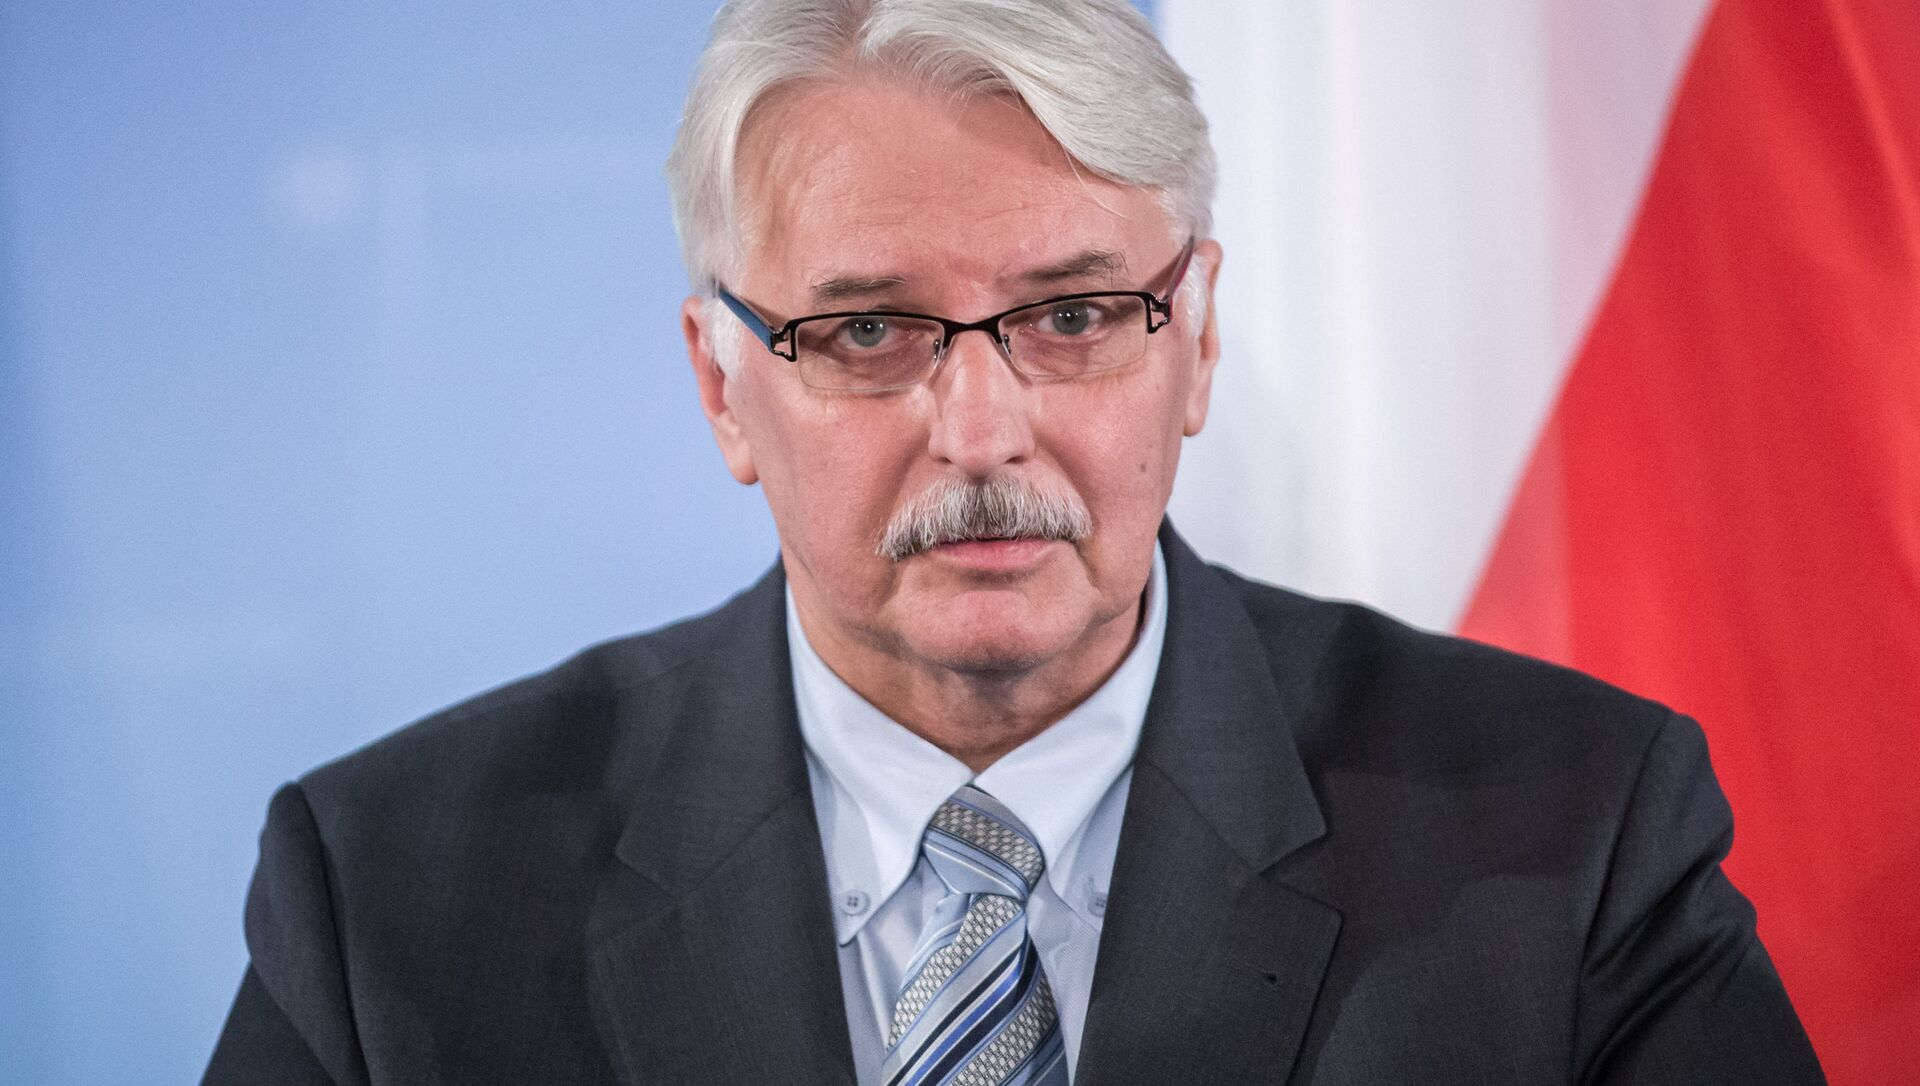 Ministro degli Esteri della Polonia Witold Waszczykowski - Sputnik Italia, 1920, 05.05.2021